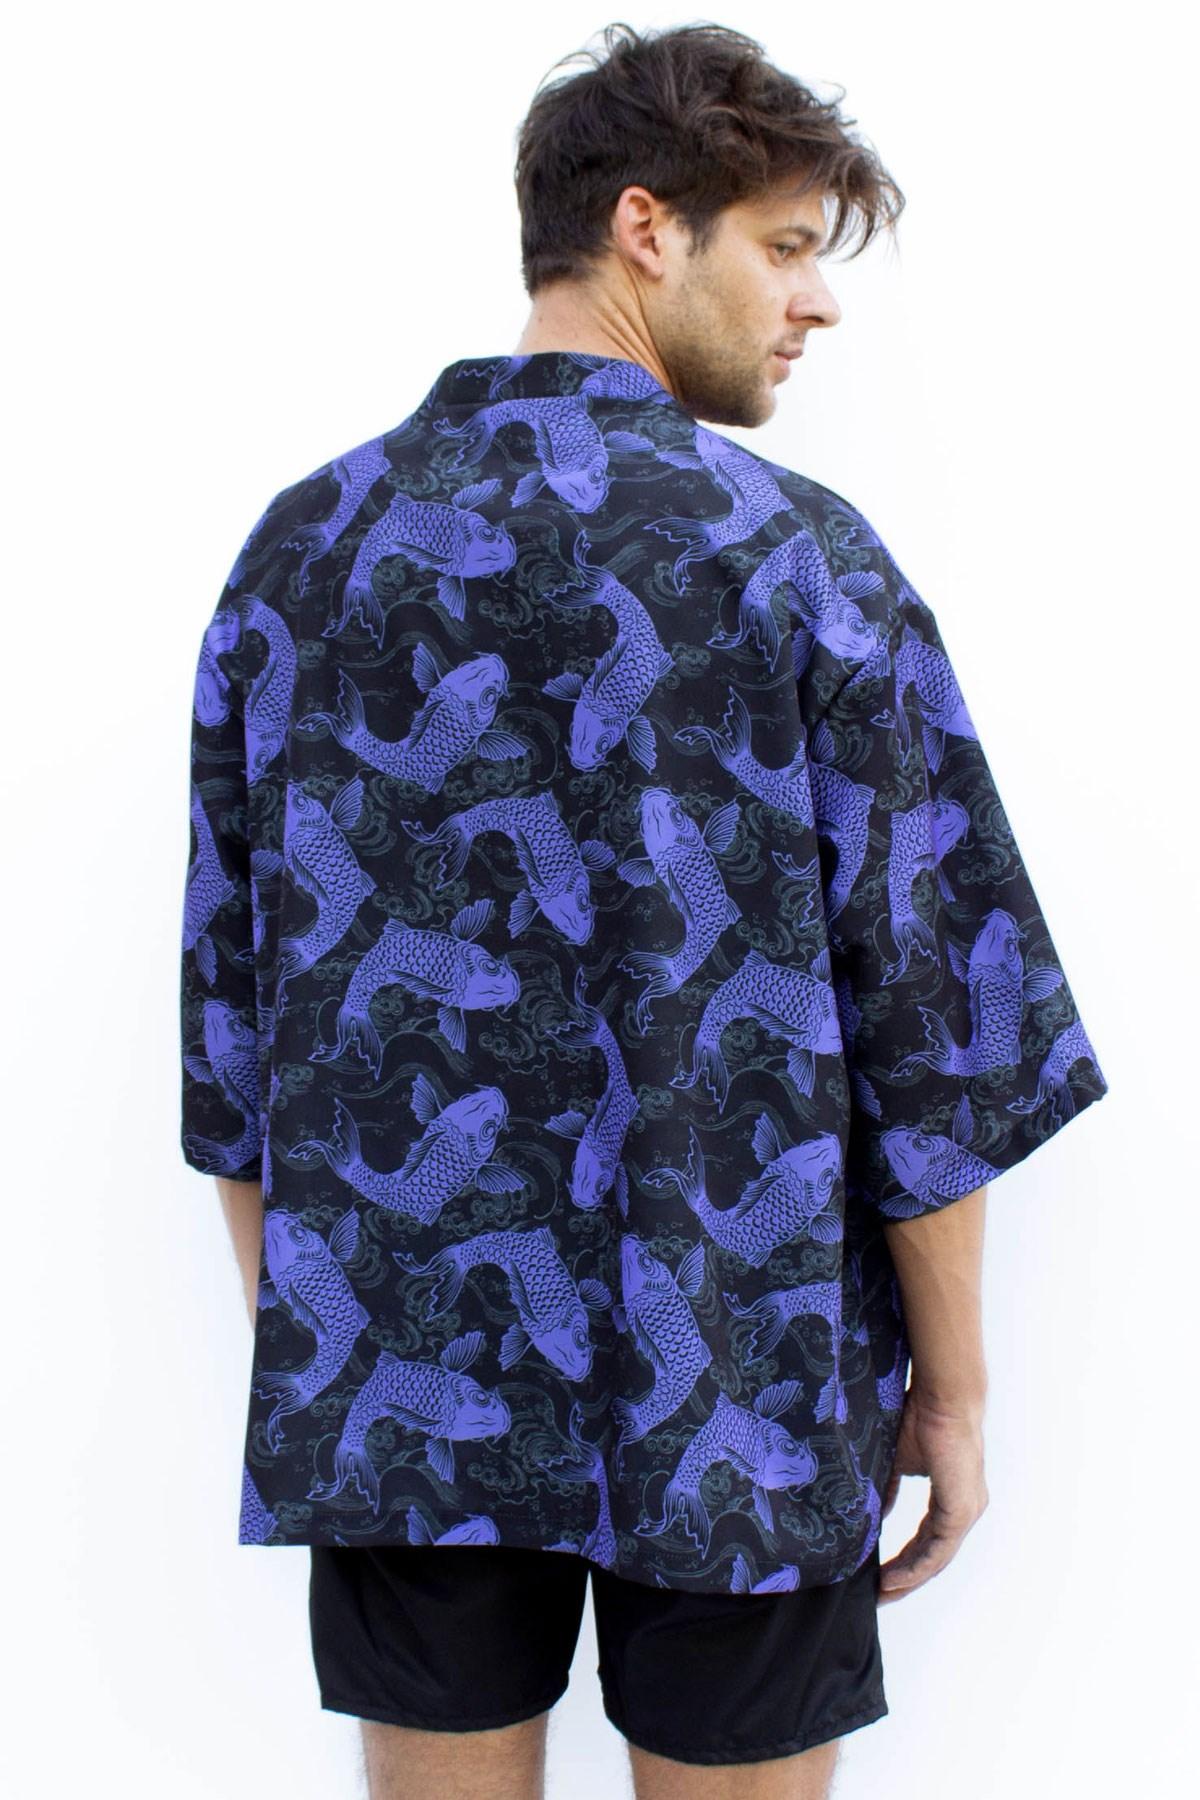 Koi Allover Baskılı Kimono - Thumbnail